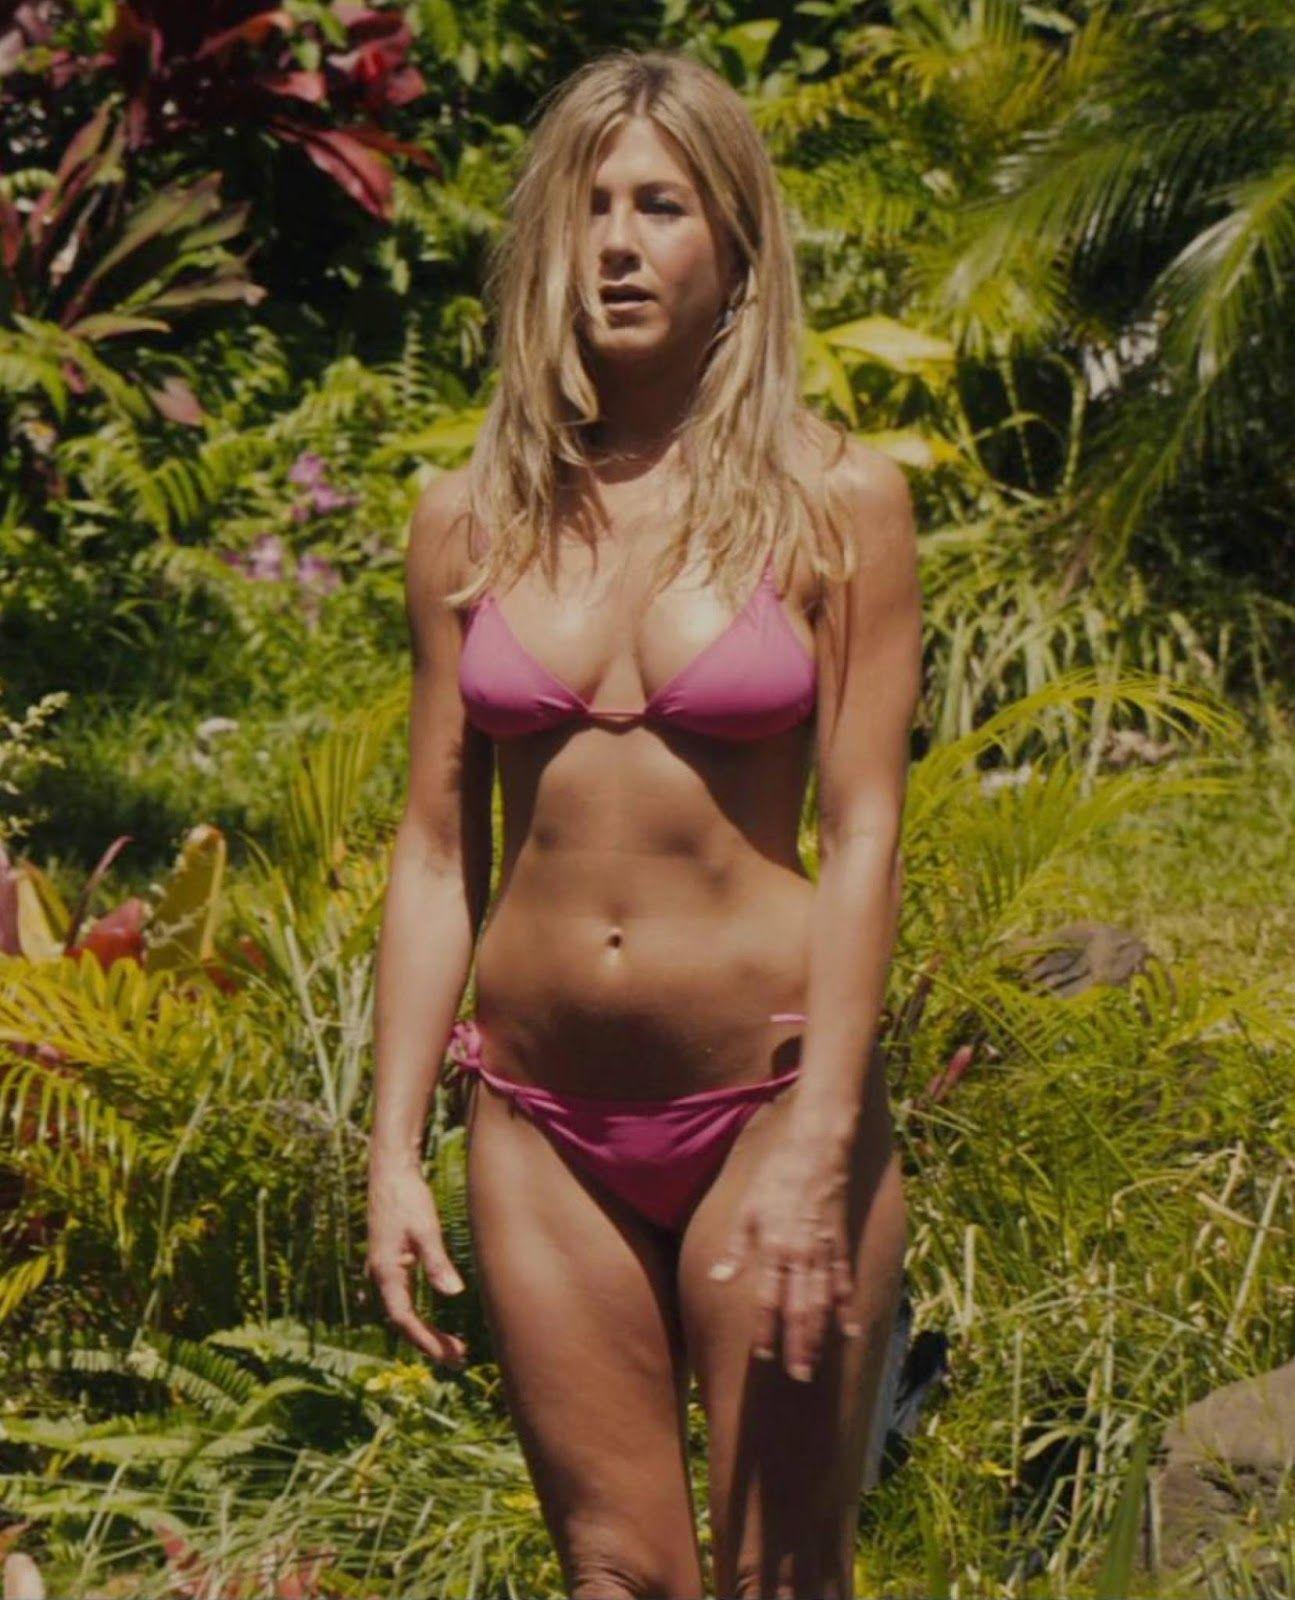 Jennifer Aniston Sexy Photos 3 600 Hot Pics Jennifer Joanna Linn Anastassakis F C2 B7r C2 B7i C2 B7e C2 B7n C2 B7d C2 B7s Jennifer Aniston Sexy Photos